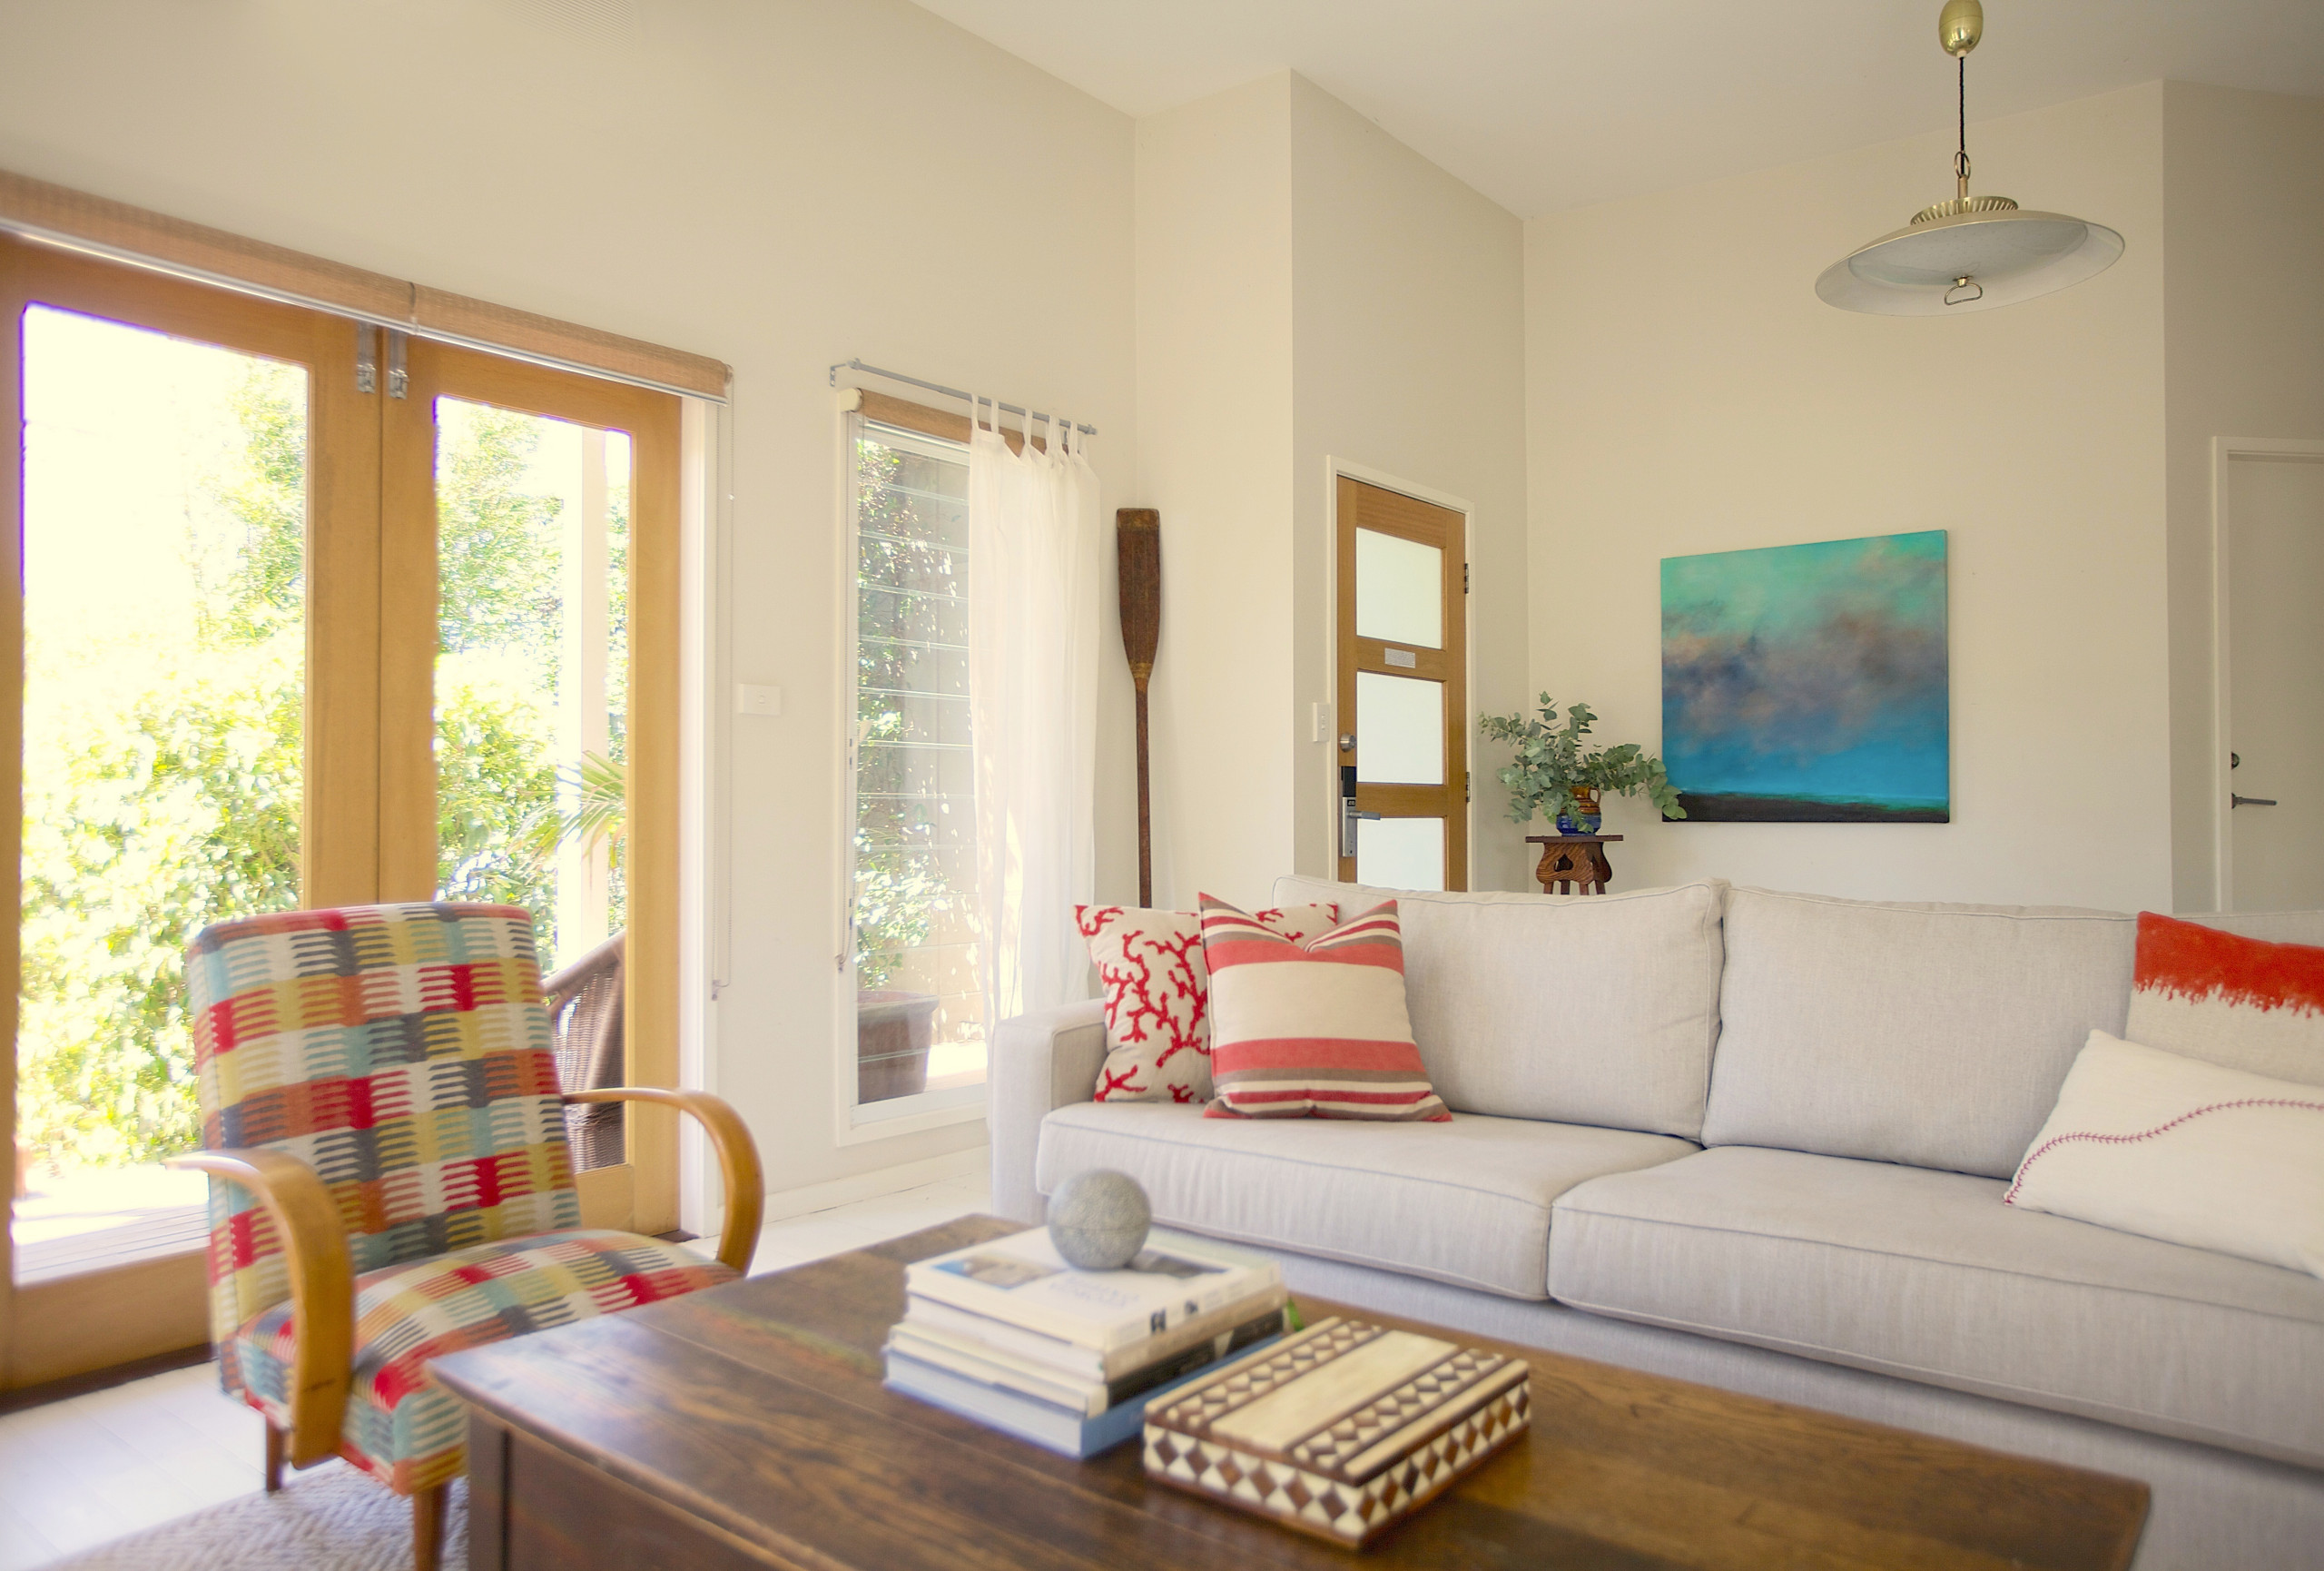 Living Room - Beach house